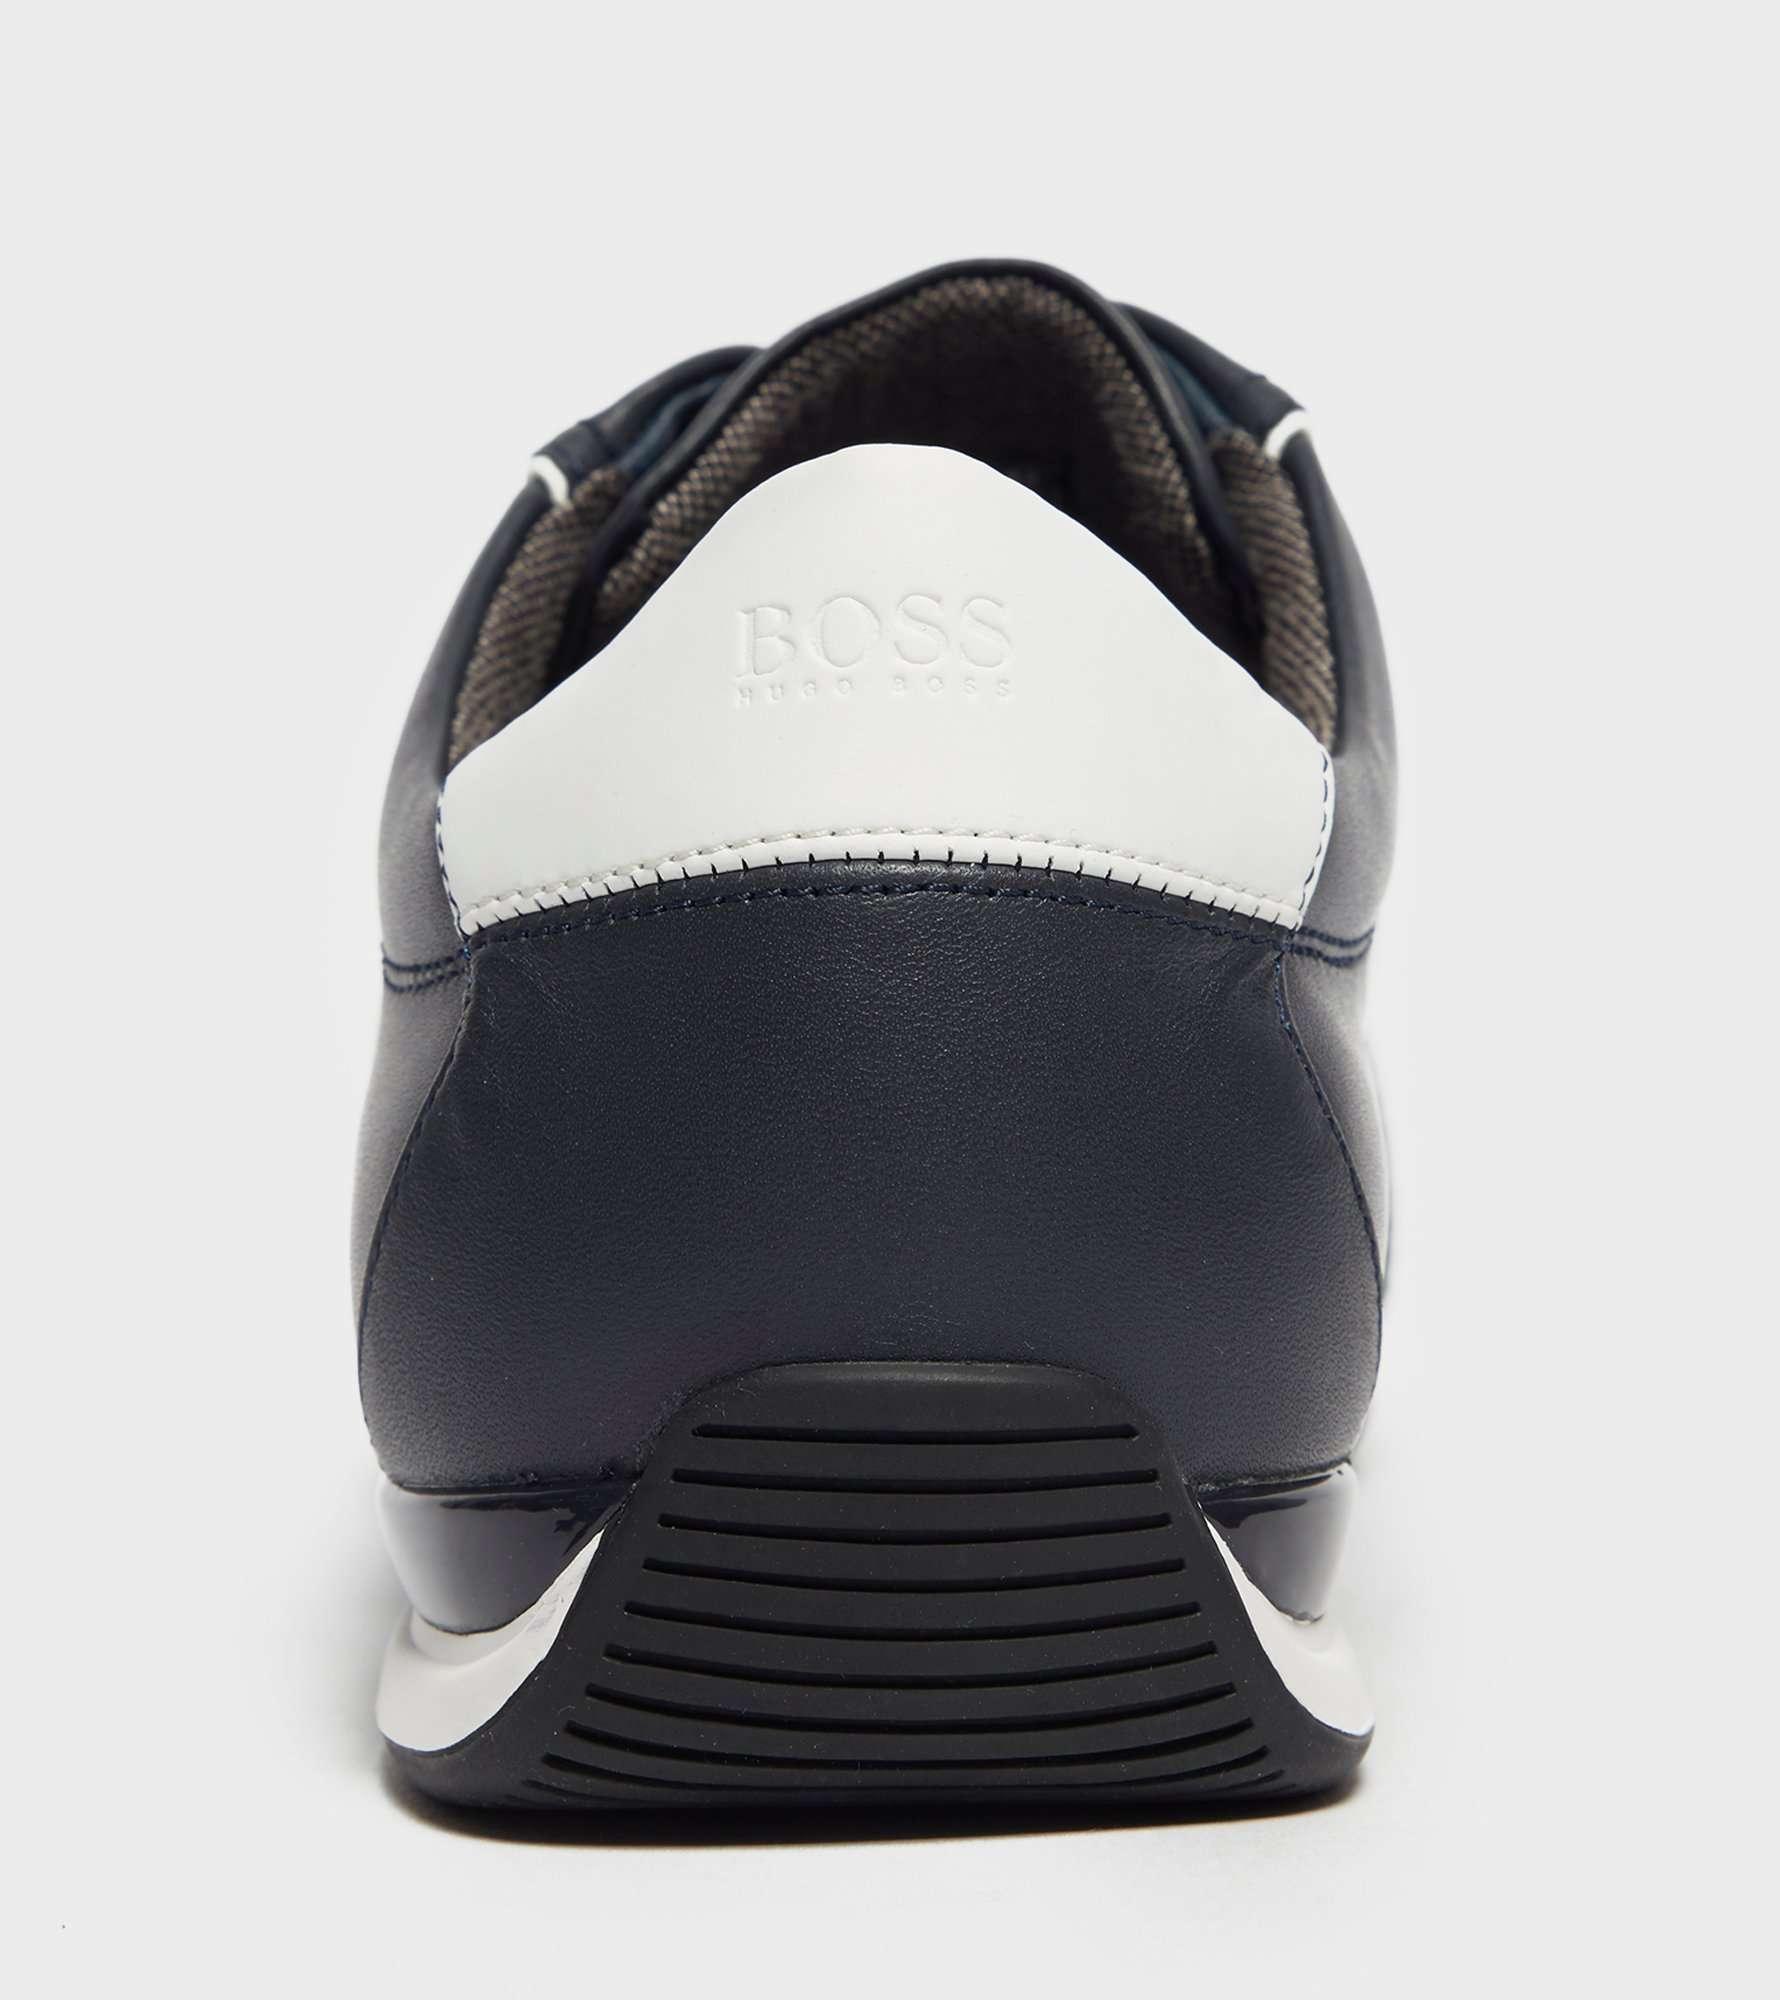 BOSS Saturn Leather